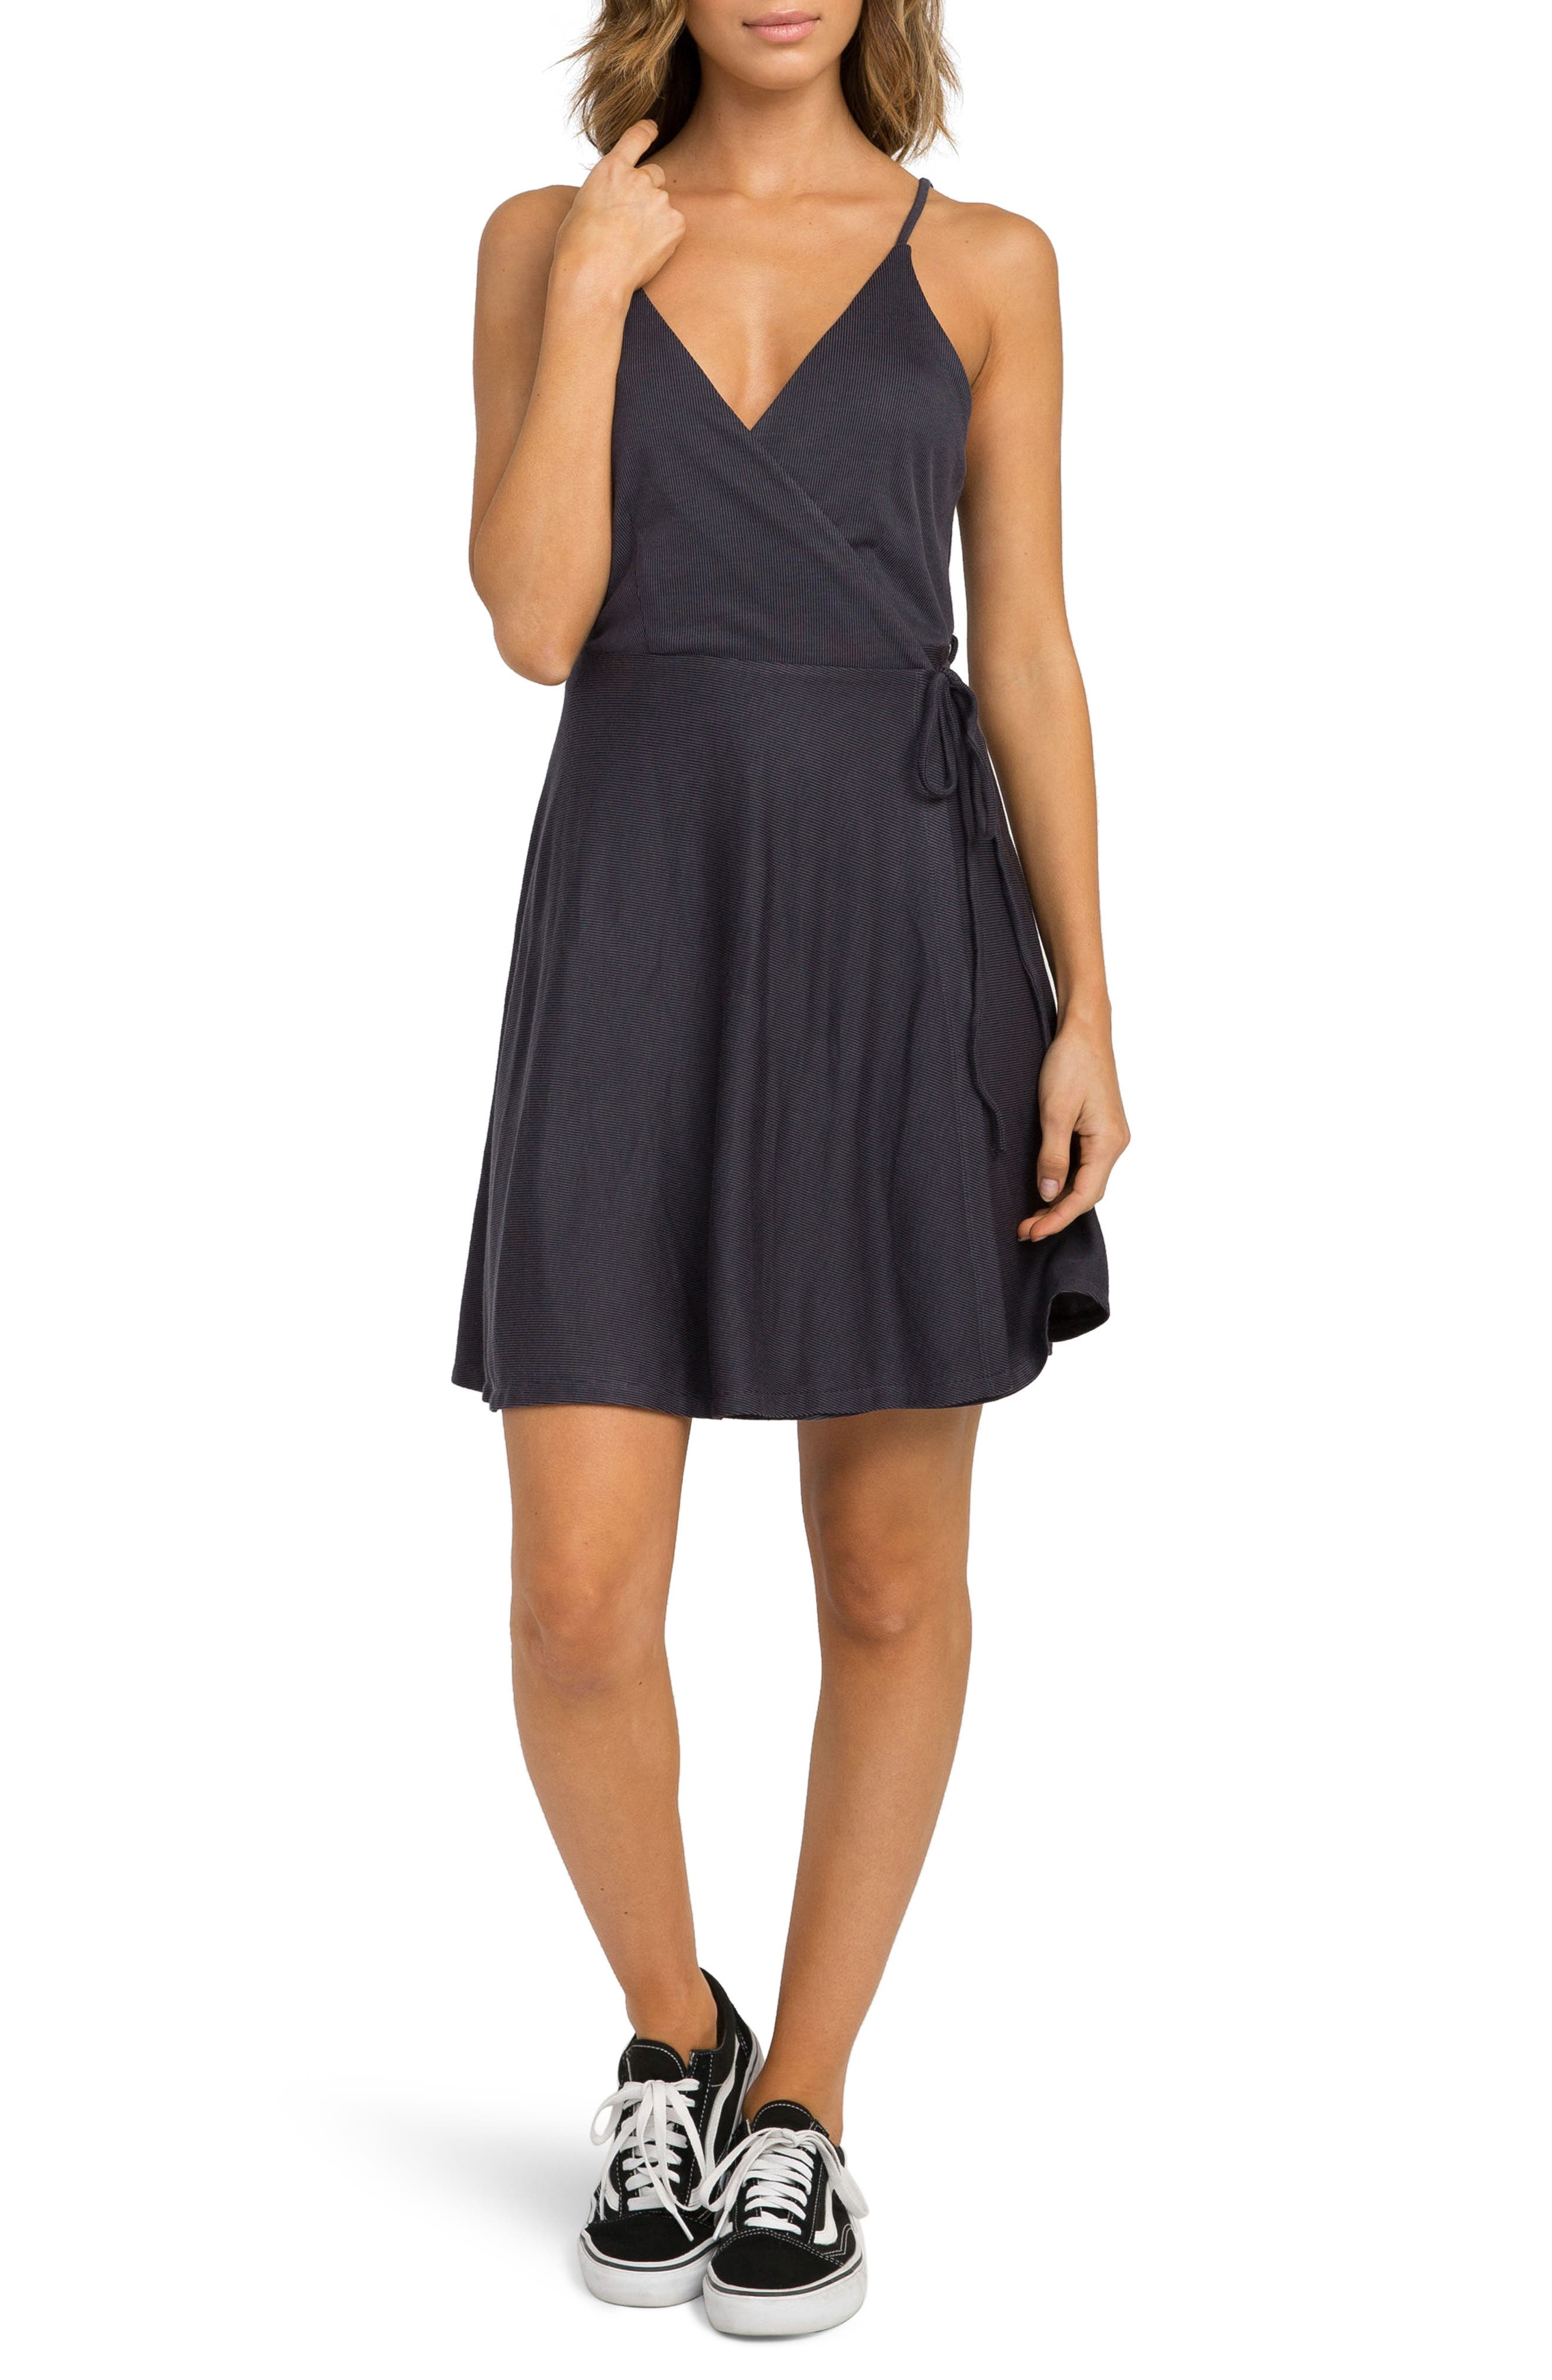 Kelso Wrap Dress,                             Main thumbnail 1, color,                             Black